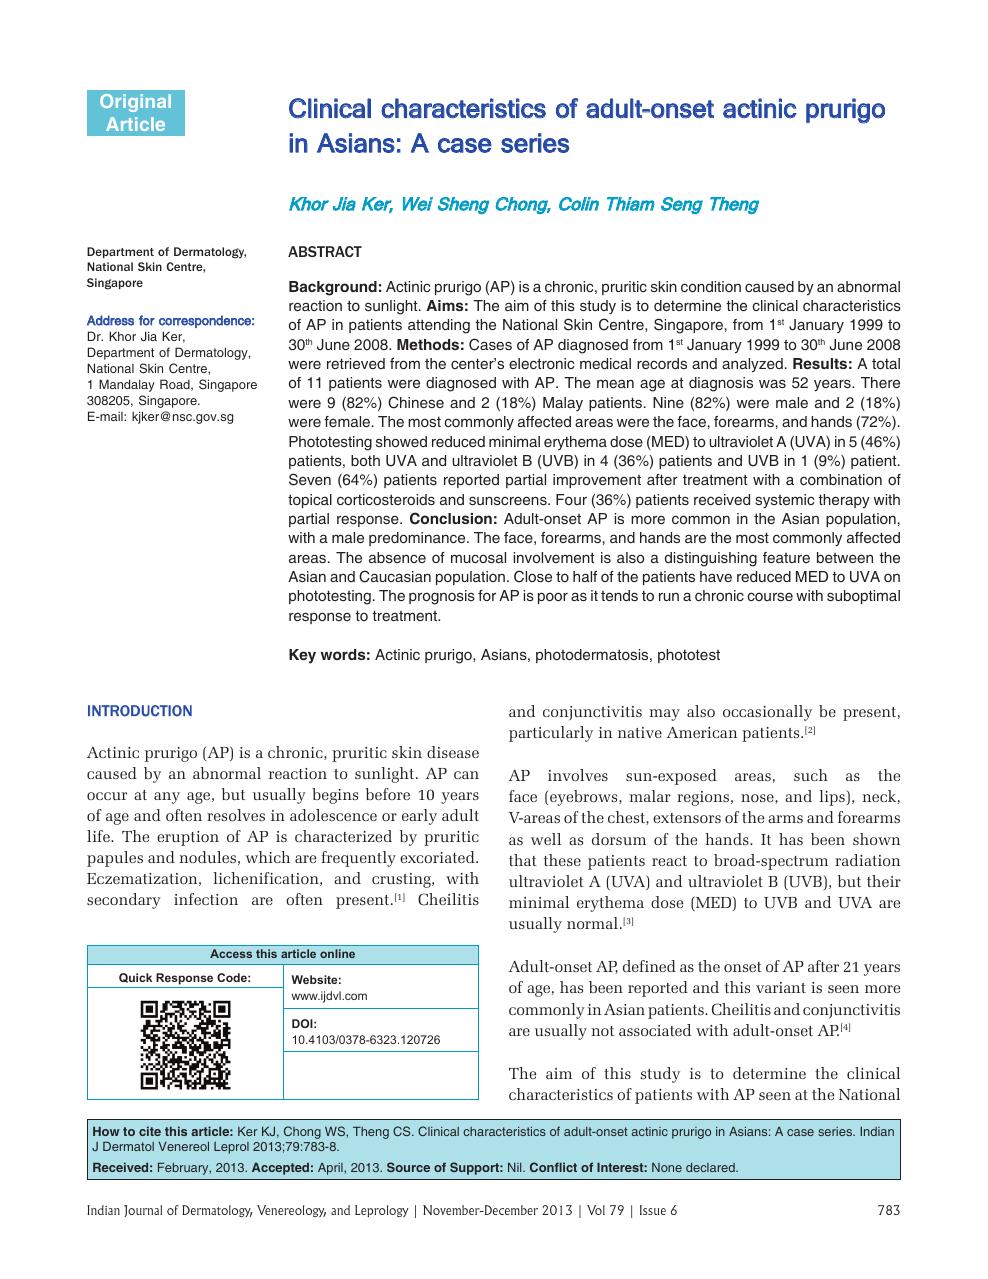 adenocarcinoma de próstata acinar gleason habitual 7 3+ 4